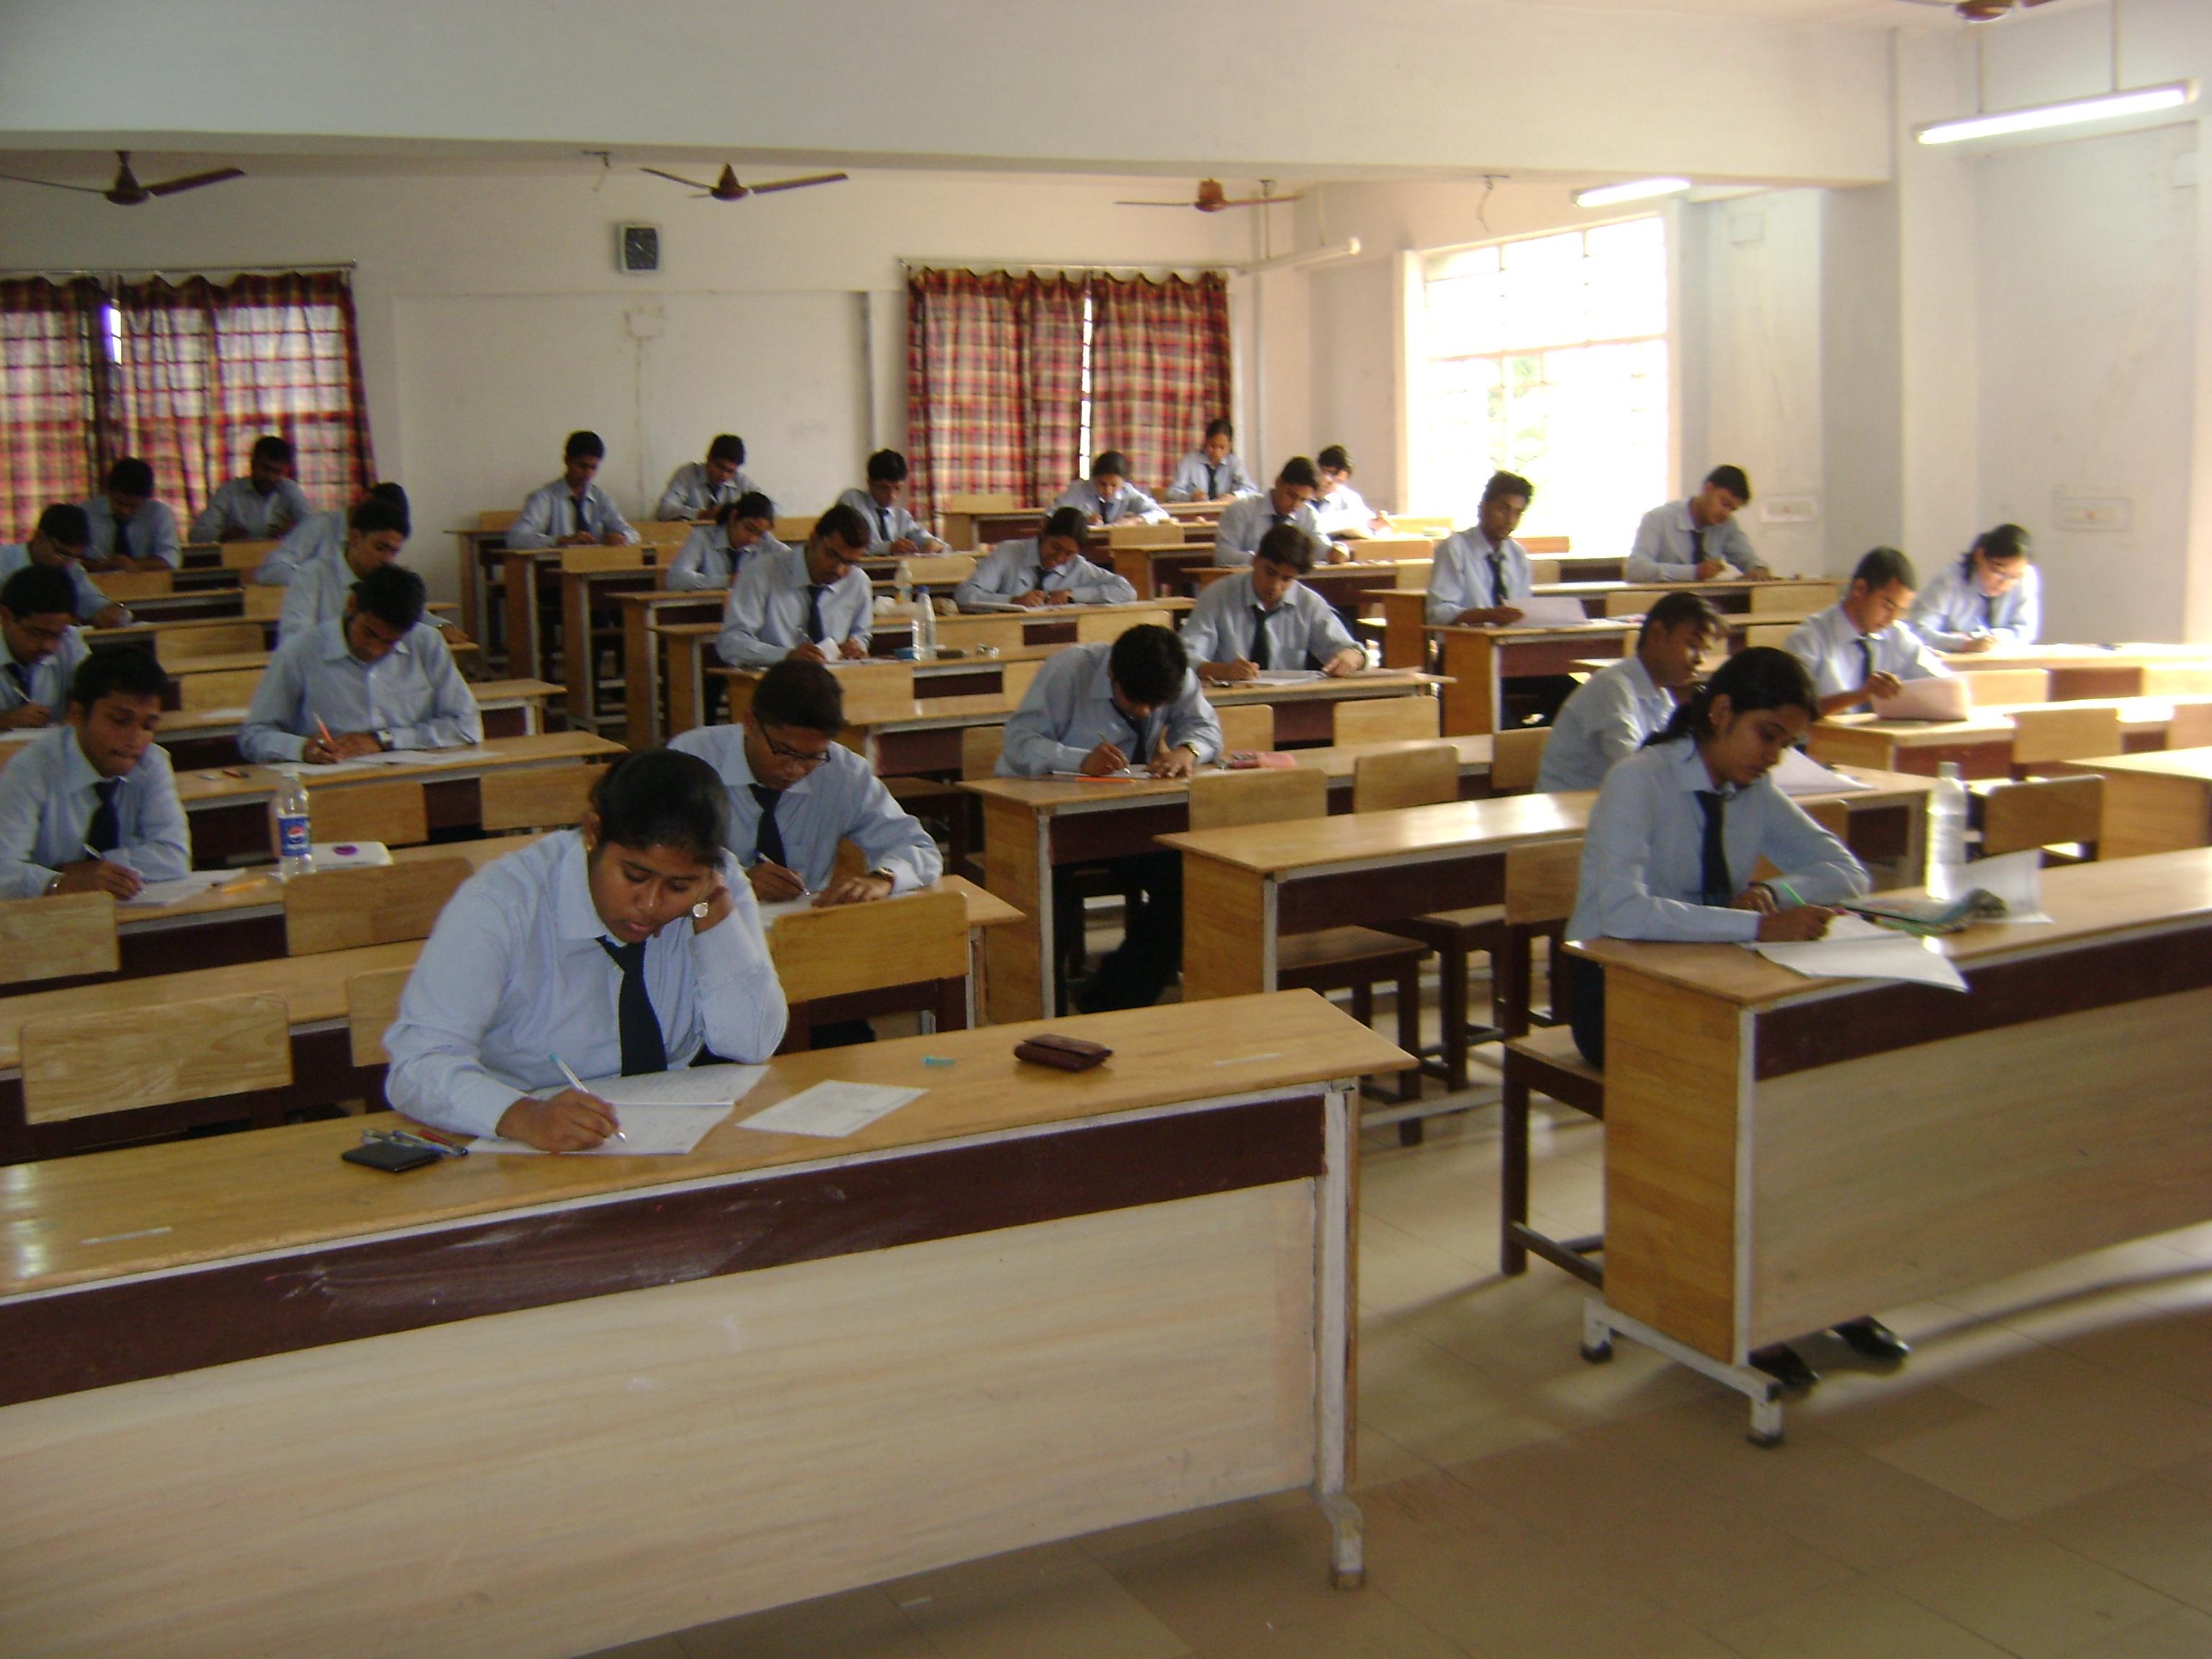 file csbm class room jpg file csbm class room jpg